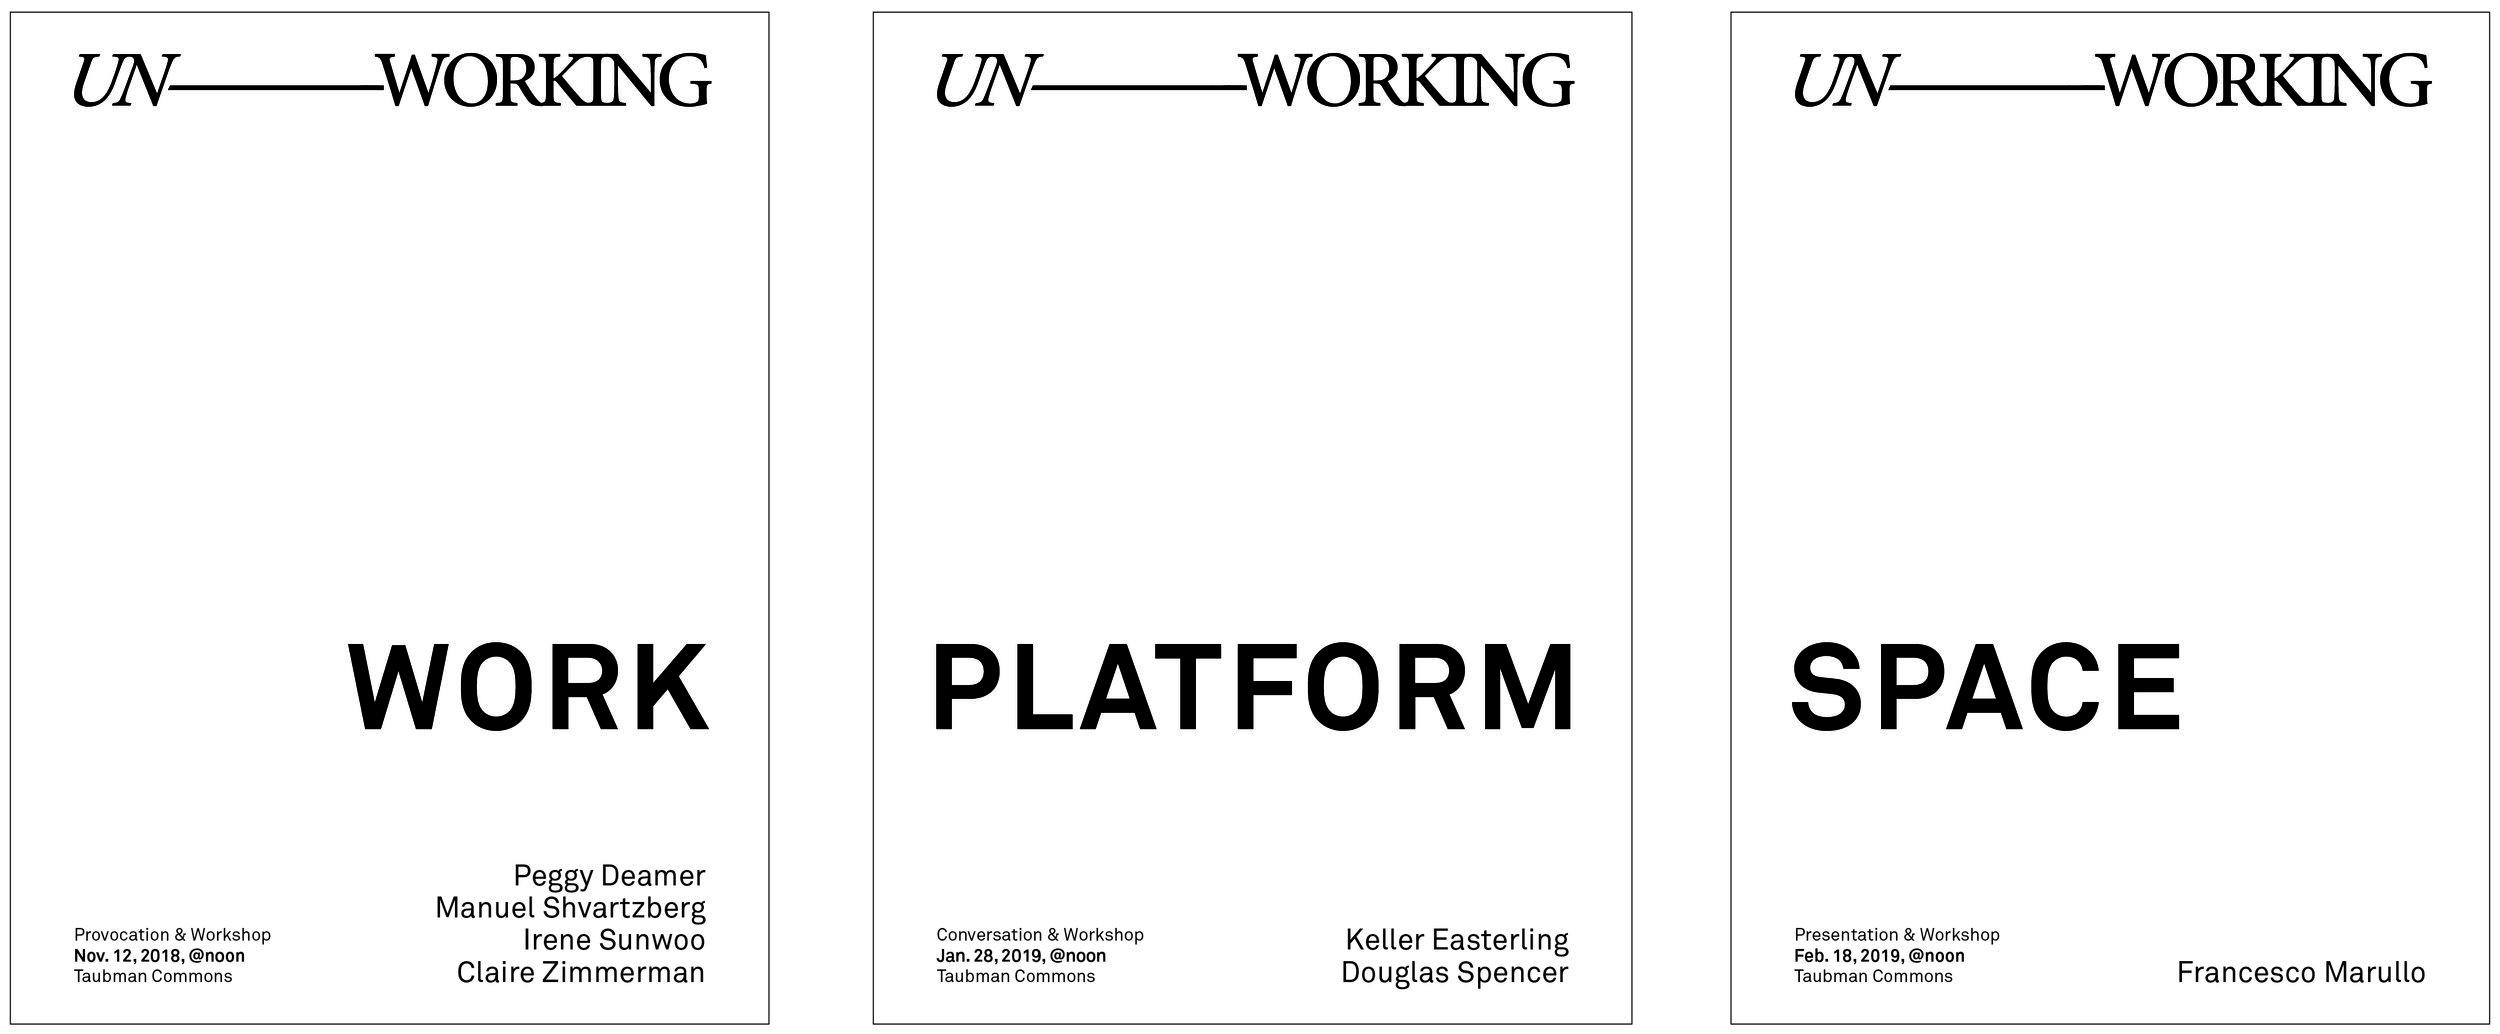 UN-WORKING POSTERS.jpg